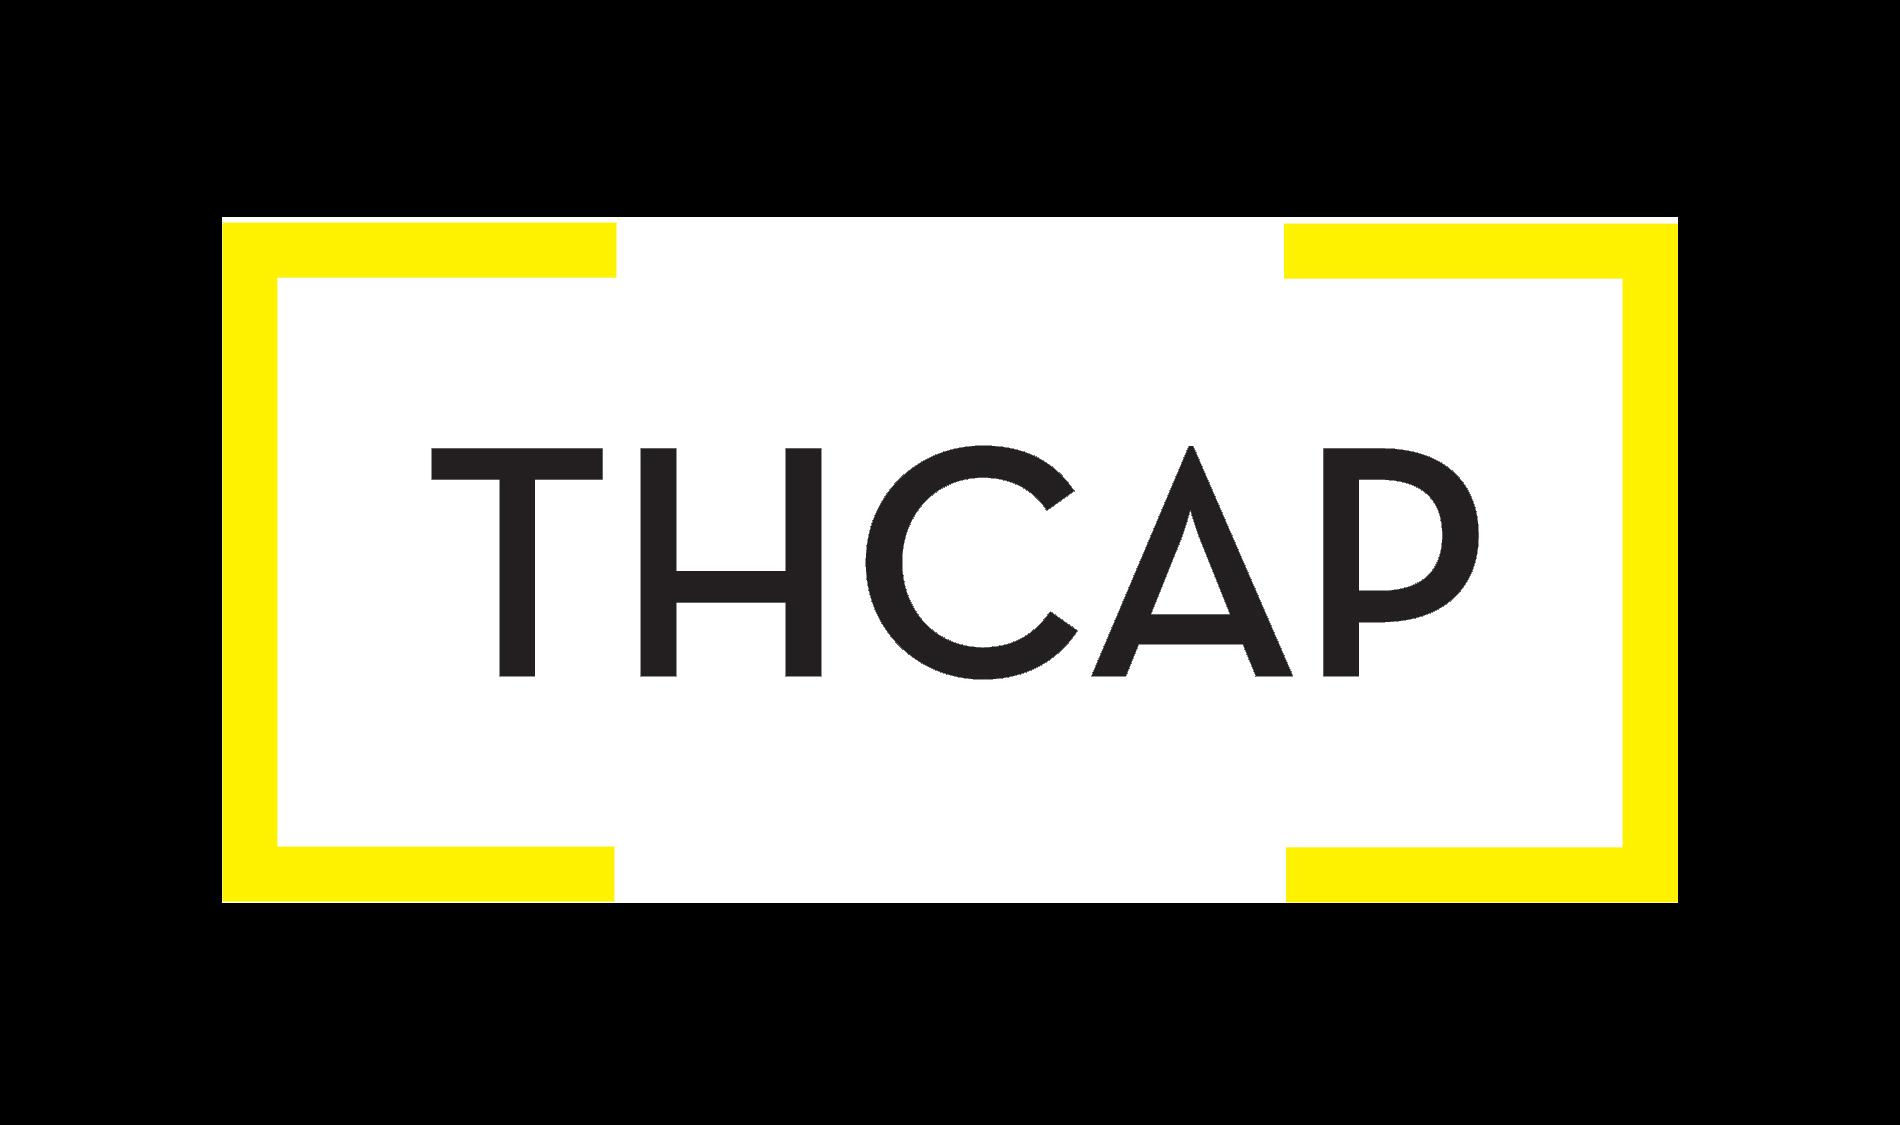 Thcap logo transperancy